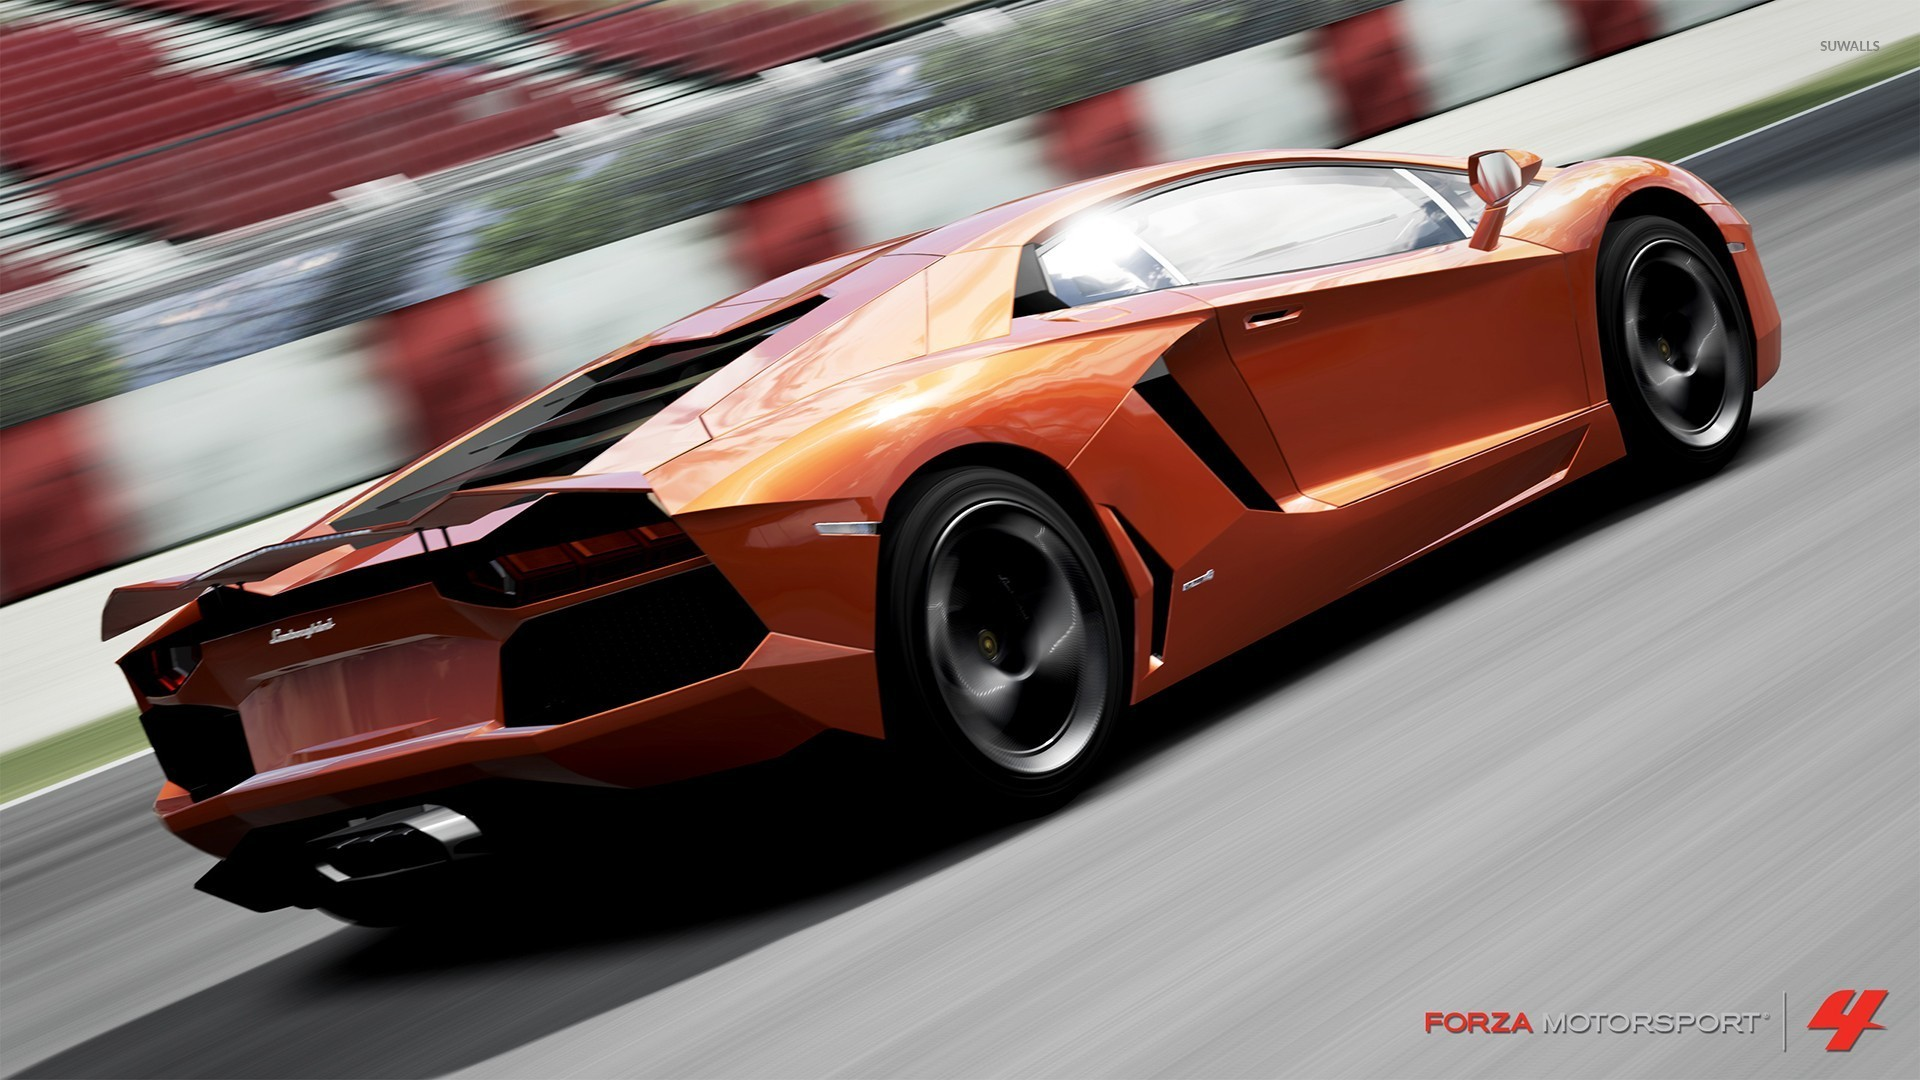 Lamborghini Aventador Forza Motorsport 4 Wallpaper Game